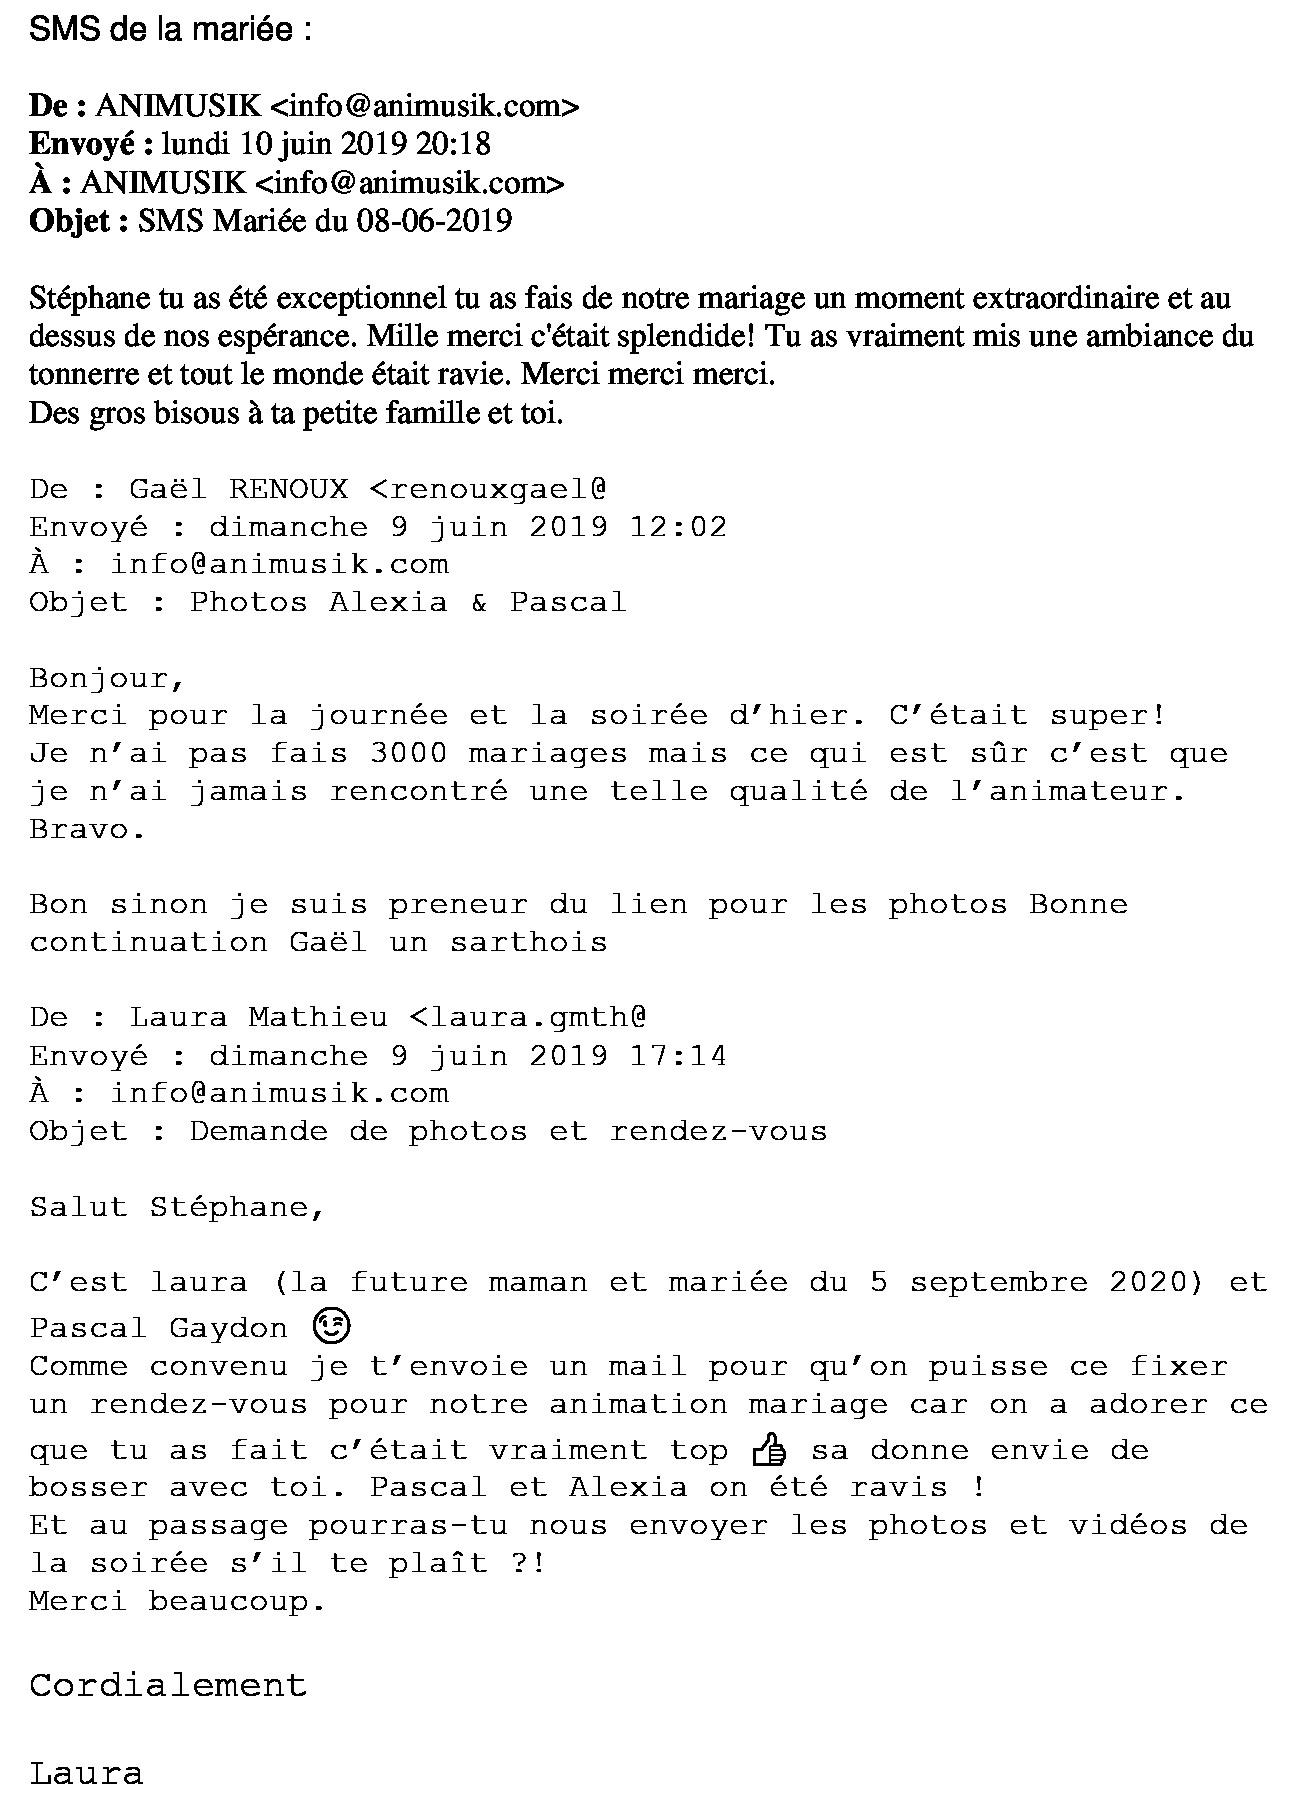 Mariage-MOLLIEX-Pascal-_-DURAND-Alexia-_